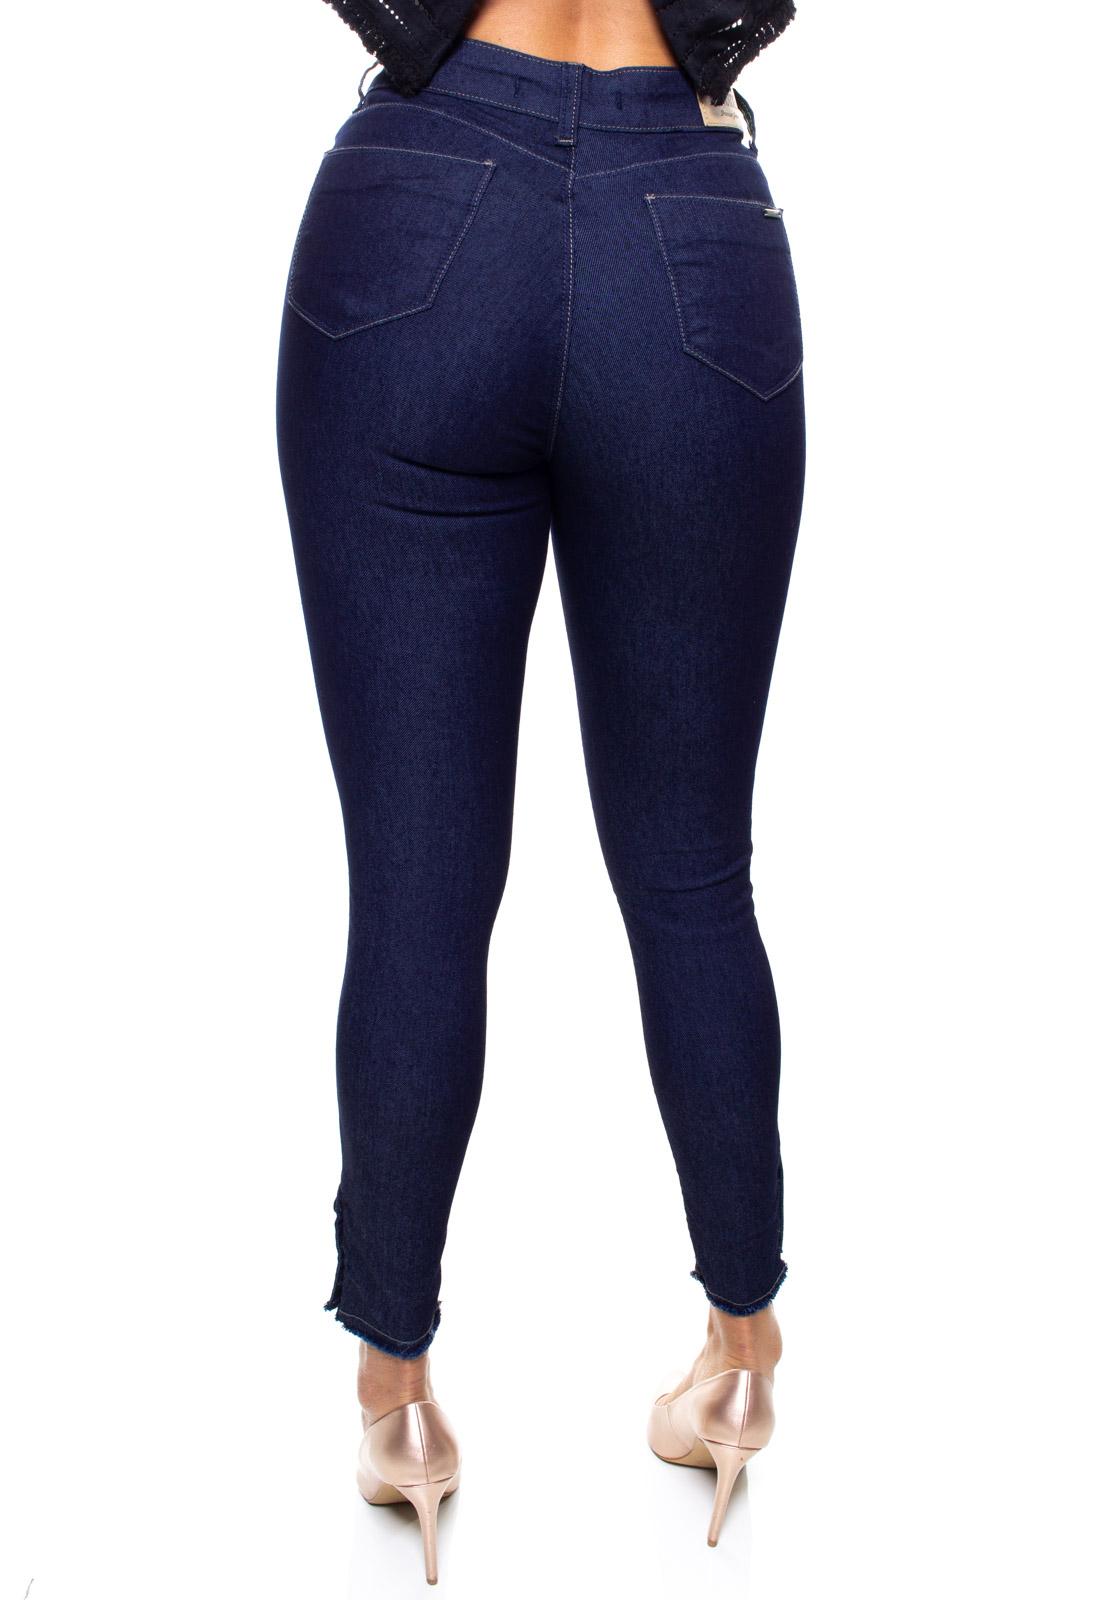 Calça  Jeans Feminina Crocker - 48121  - CROCKER JEANS